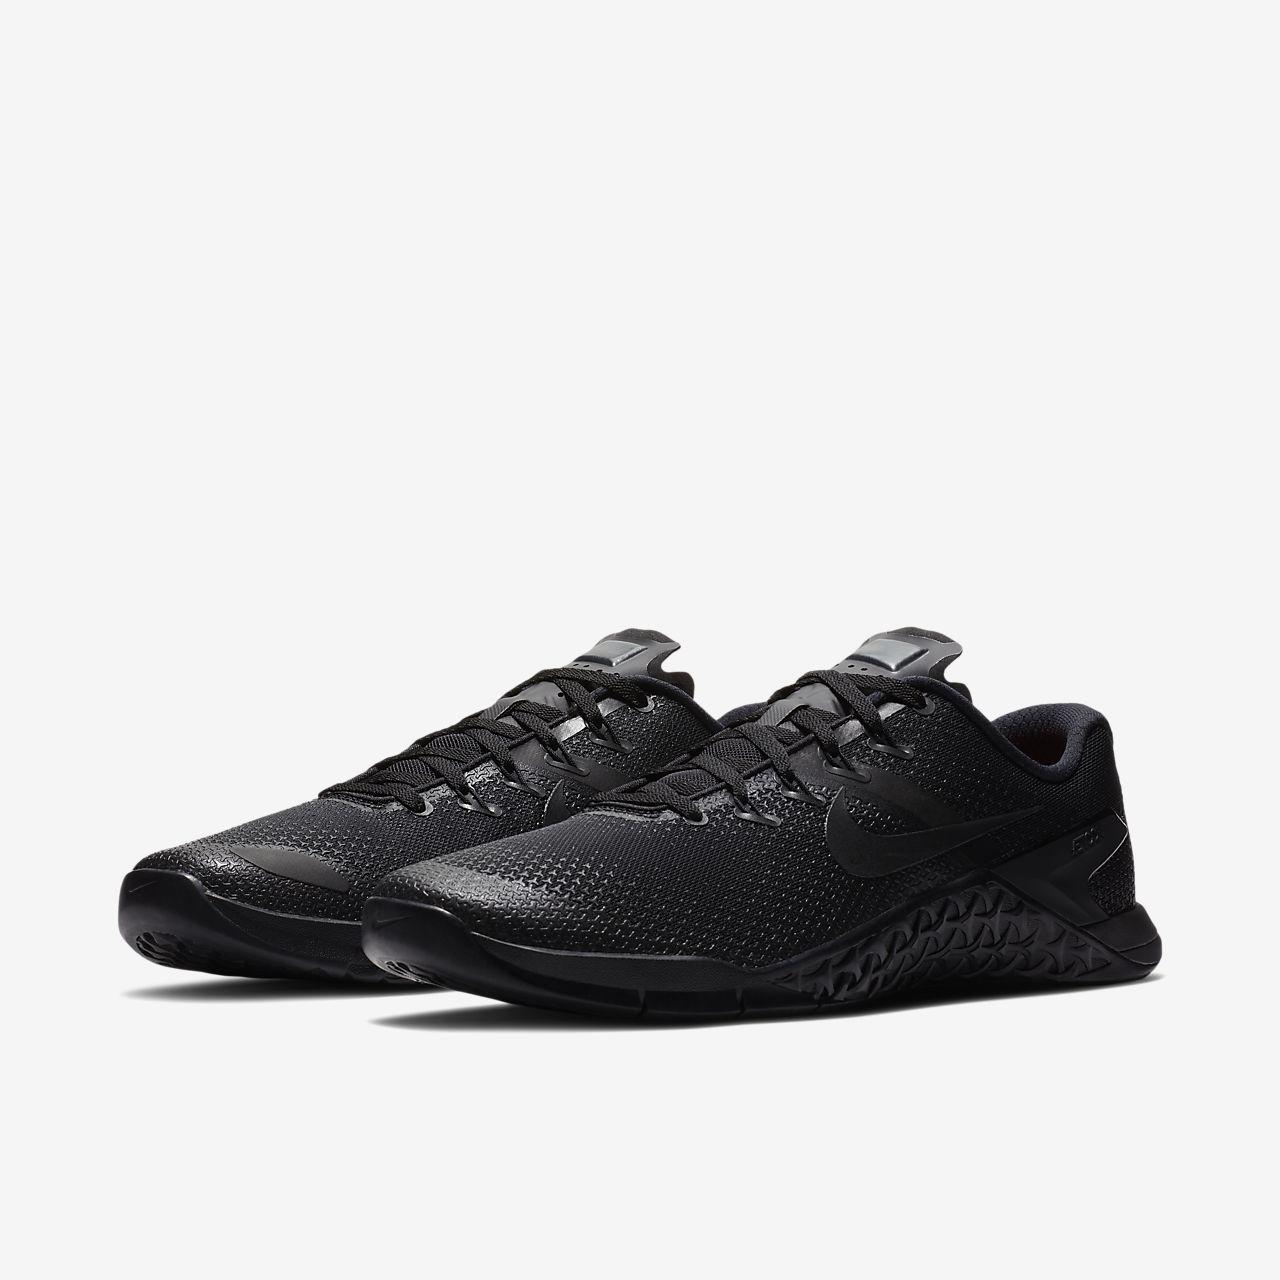 c4385656204 Nike Metcon 4 Men s Cross Training Weightlifting Shoe. Nike.com AE